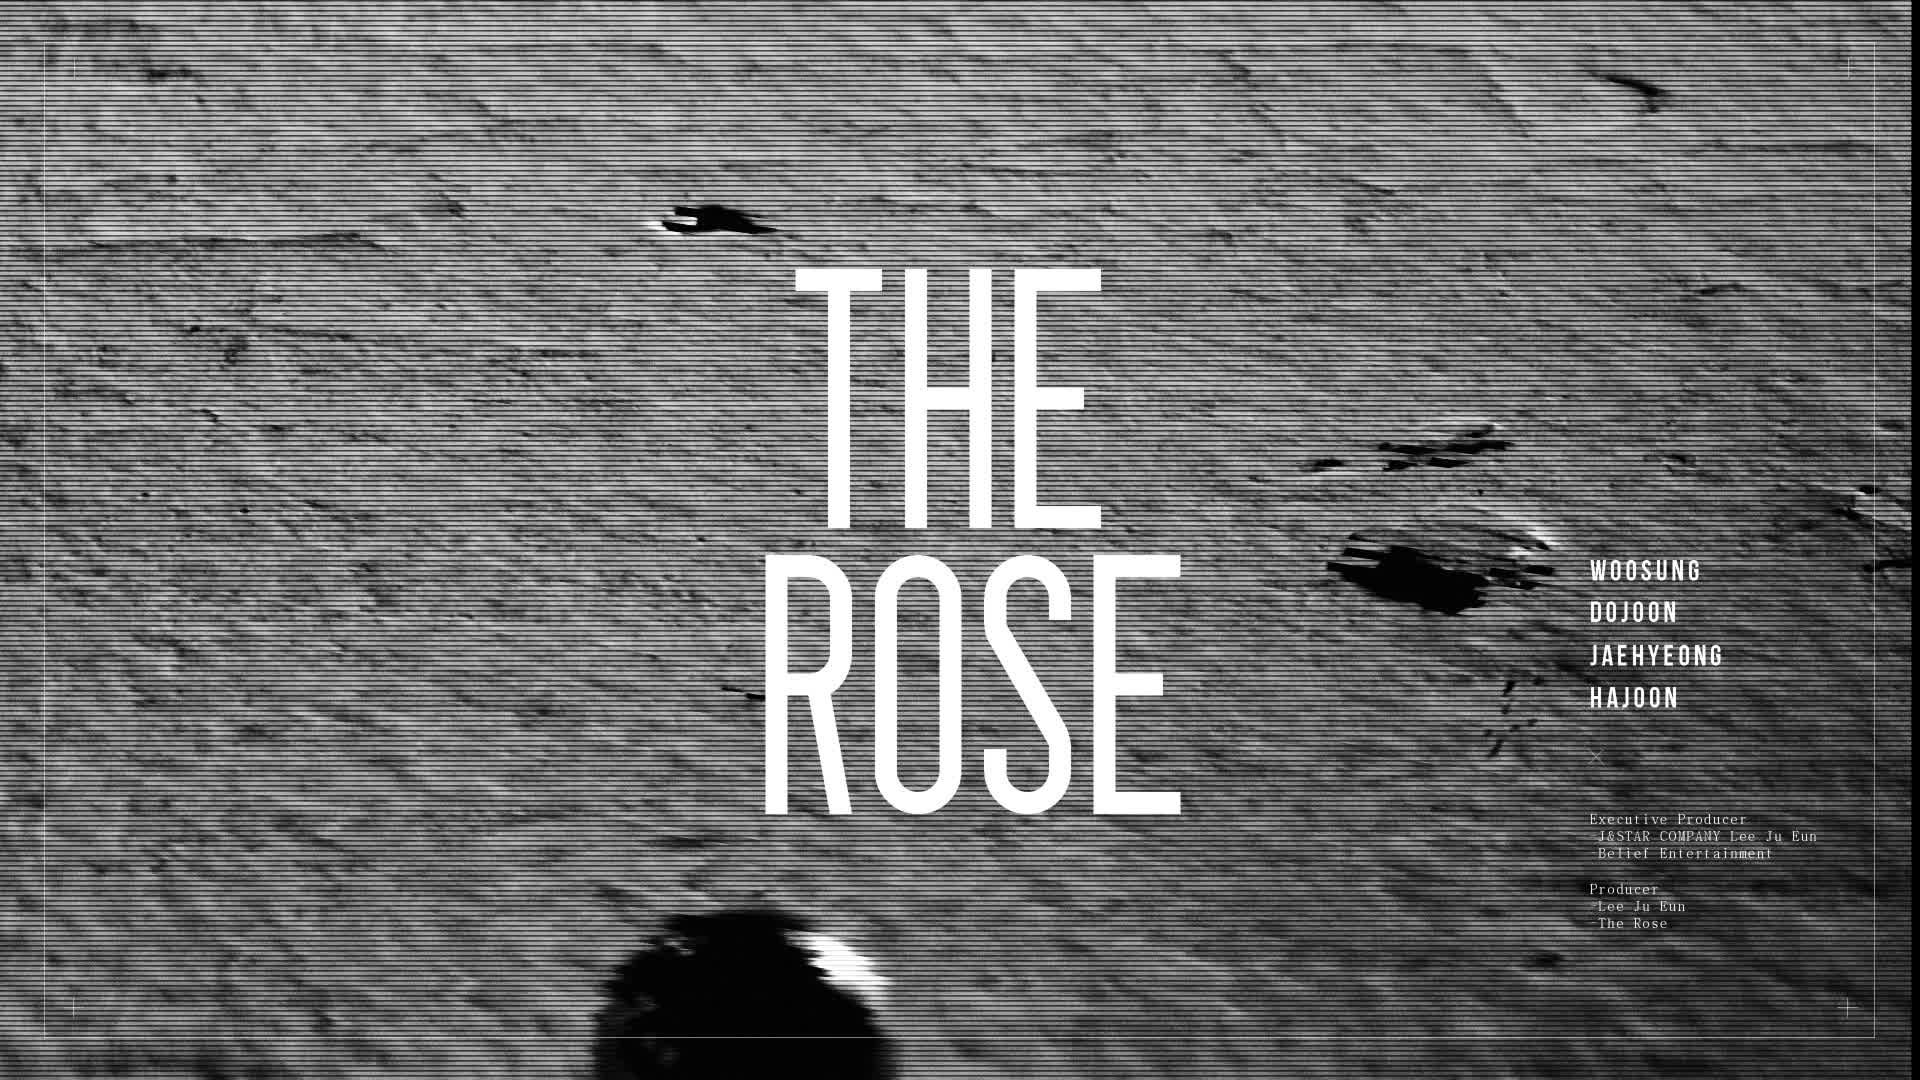 Band The Rose Teaser